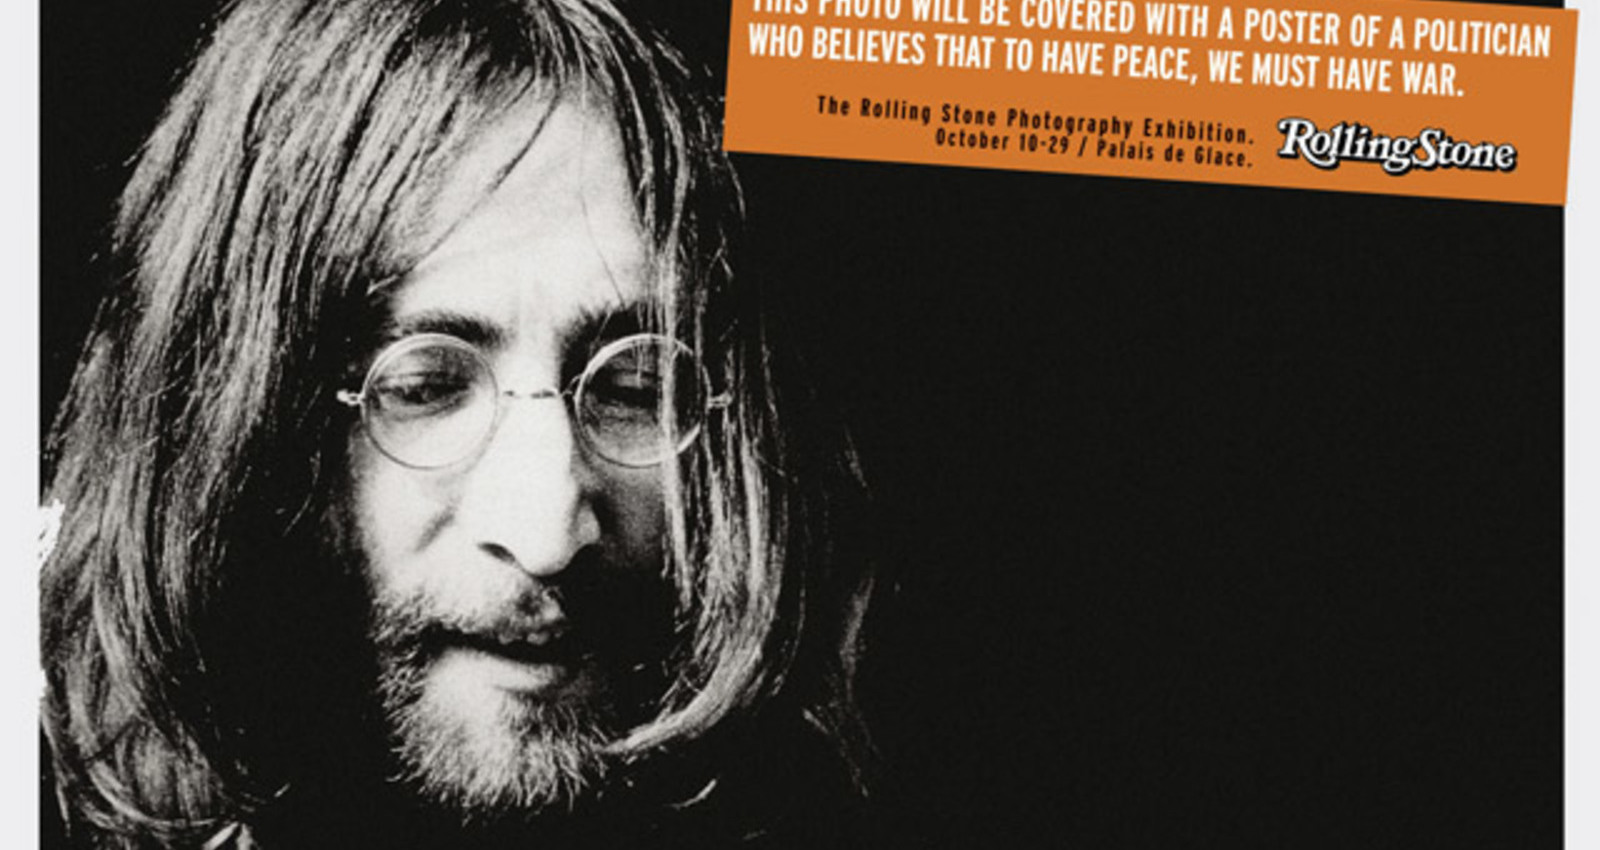 Lennon, Richards, Kurt Cobain